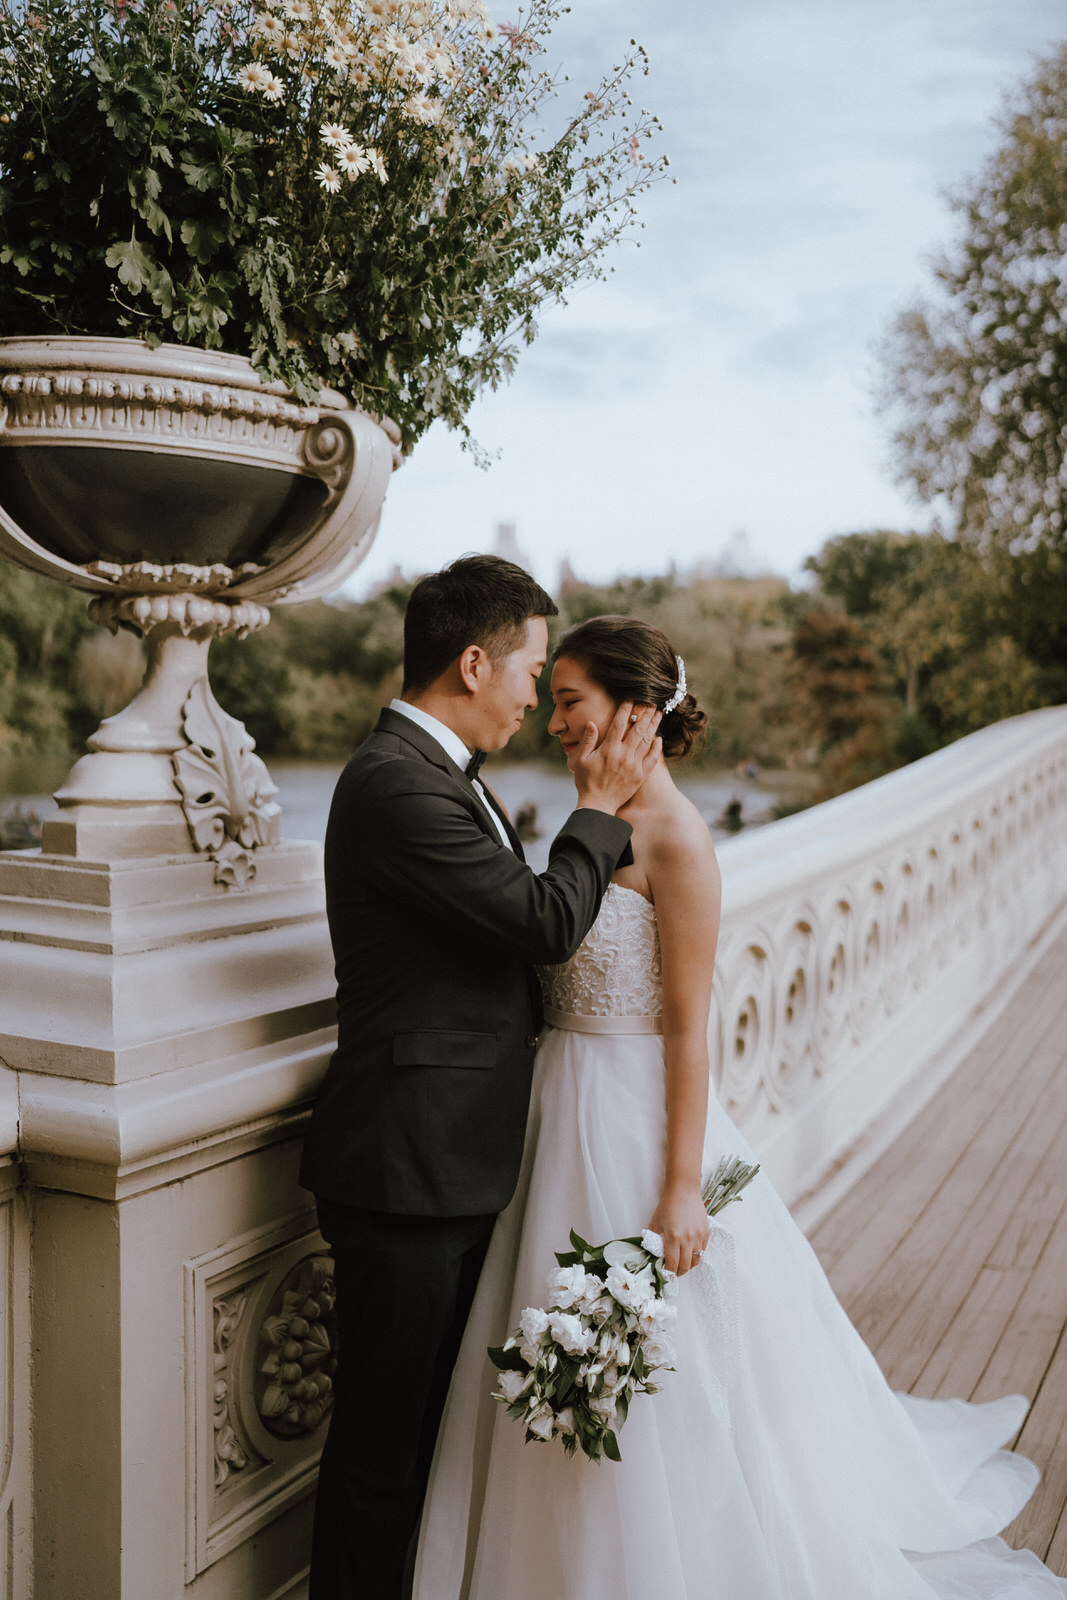 Central Park Elopement Photos-Bow Bridge-Michelle Gonzalez Photography- New York Wedding Photographer-9.jpg